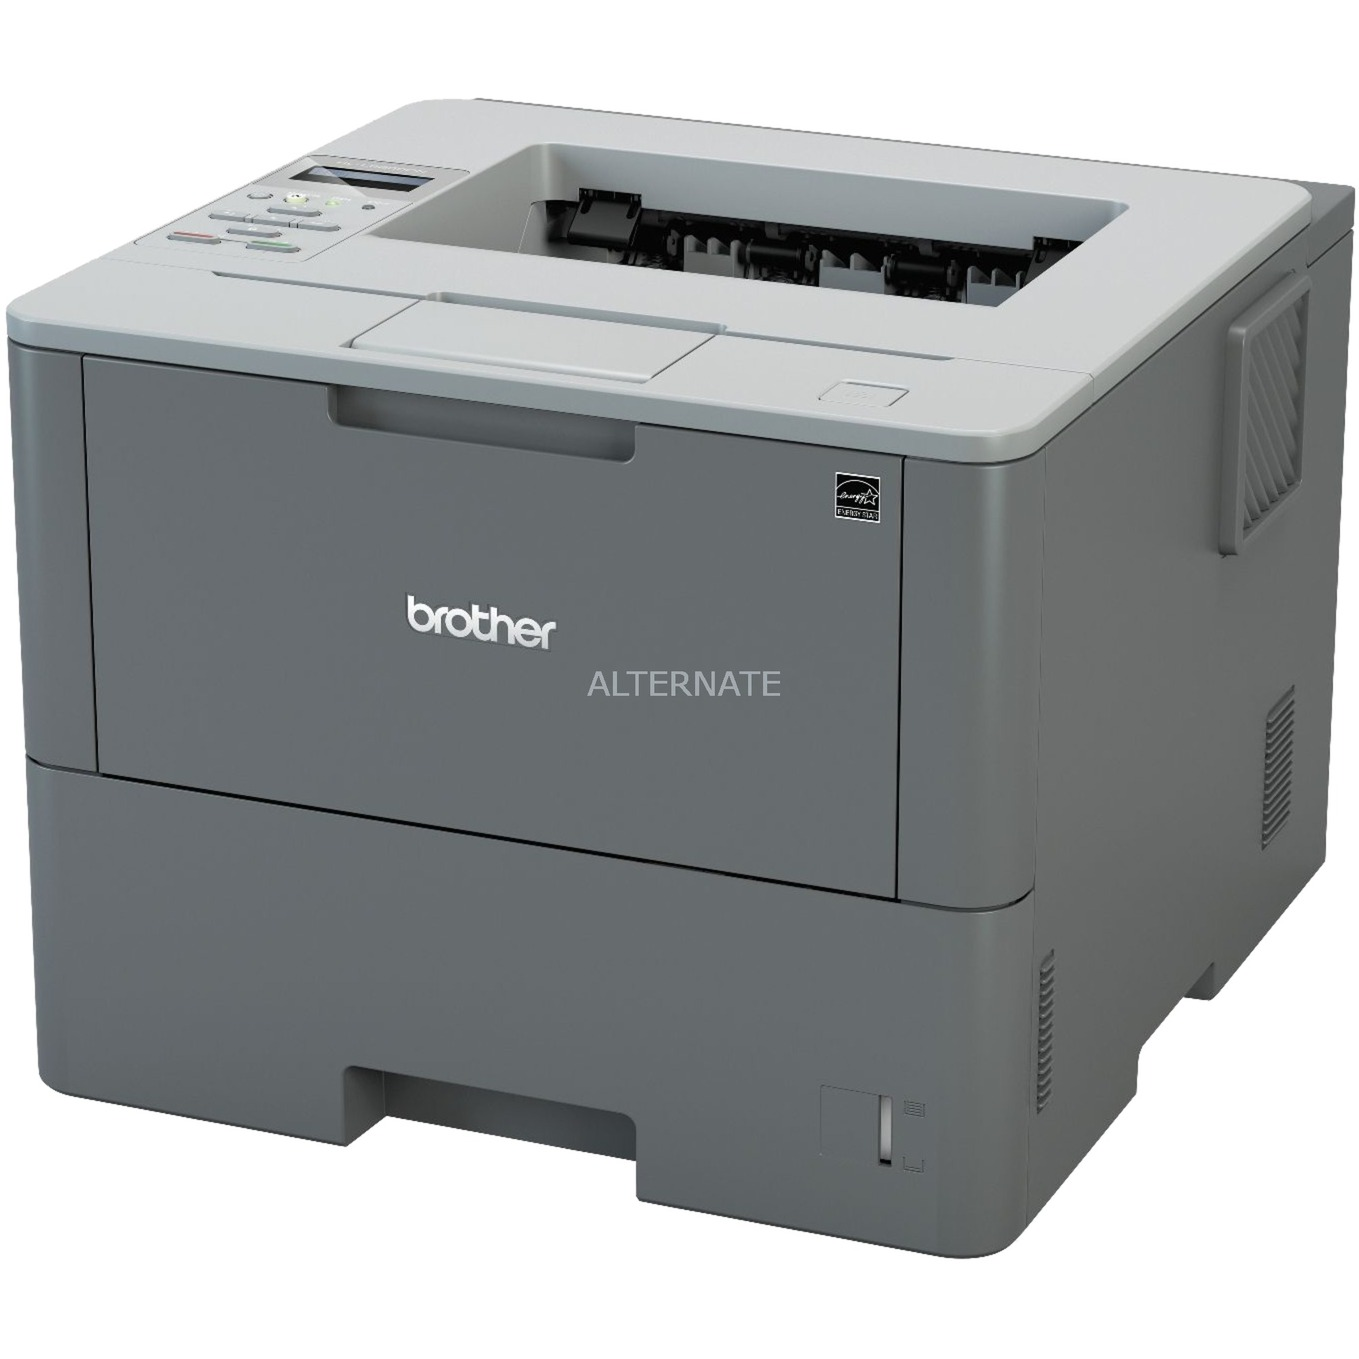 HL-L6250DN, Impresora láser